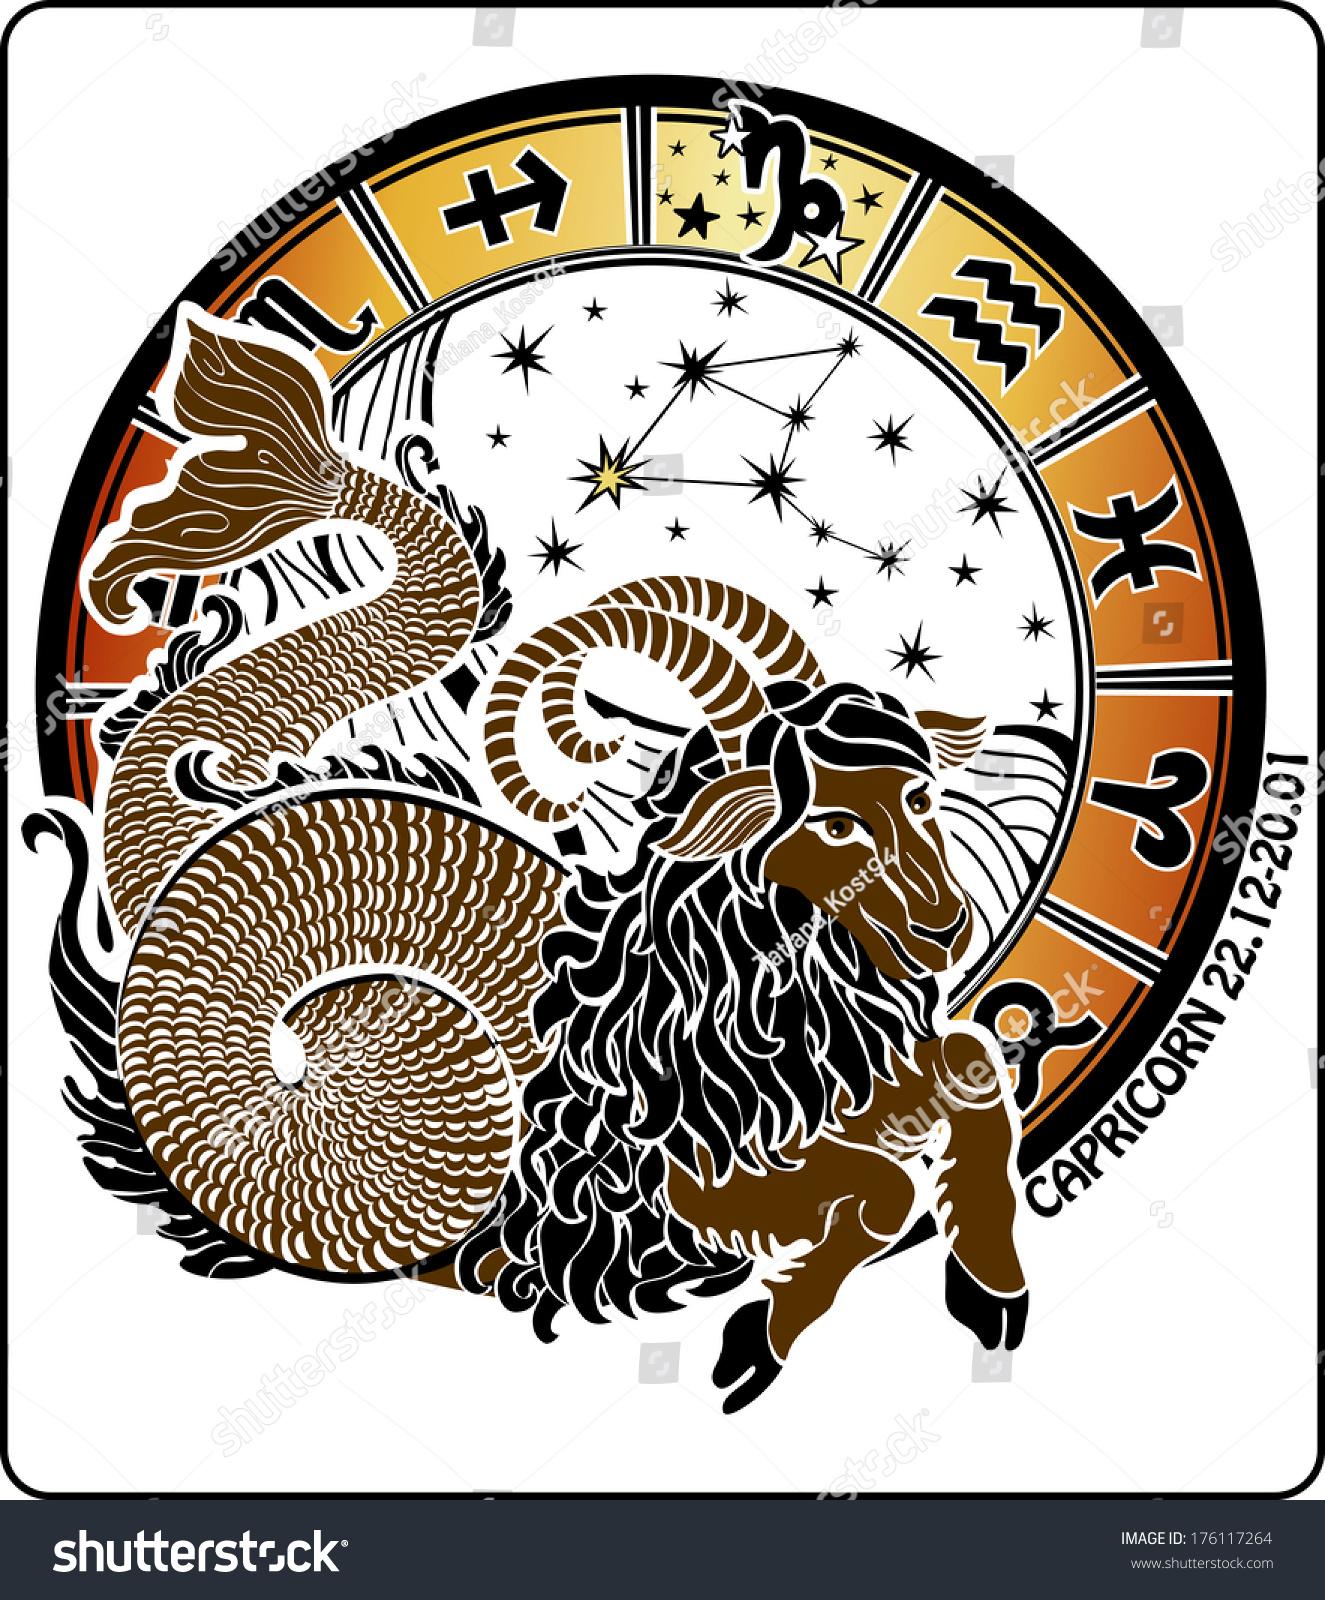 Big Capricorn Symbols All Zodiac Signs Stock Vector Royalty Free